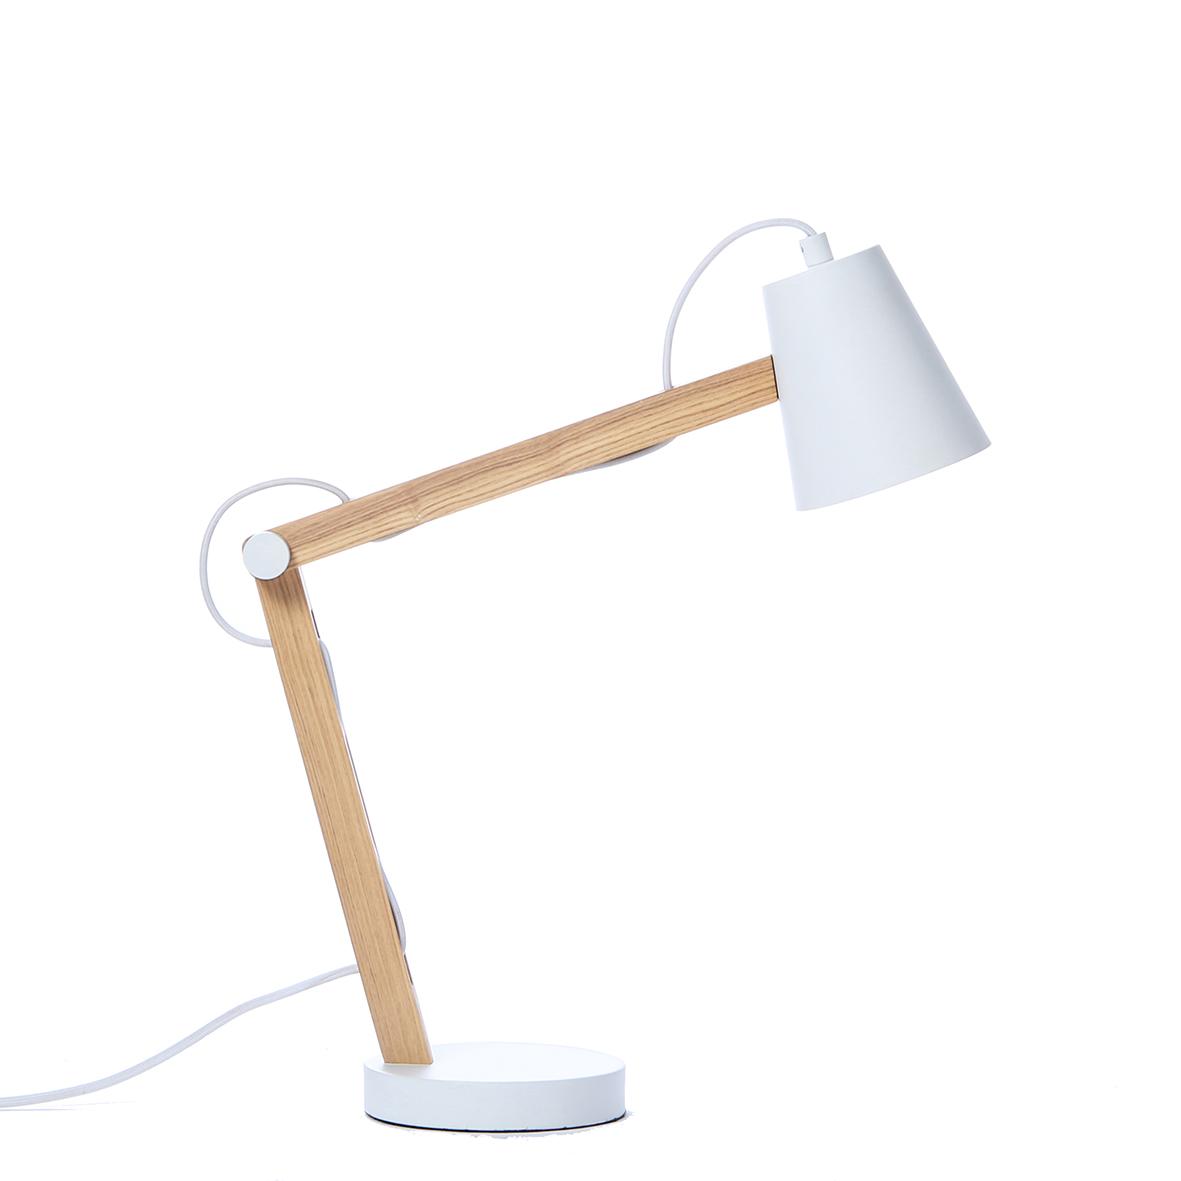 Lampa de birou Play White Matt / Nature title=Lampa de birou Play White Matt / Nature